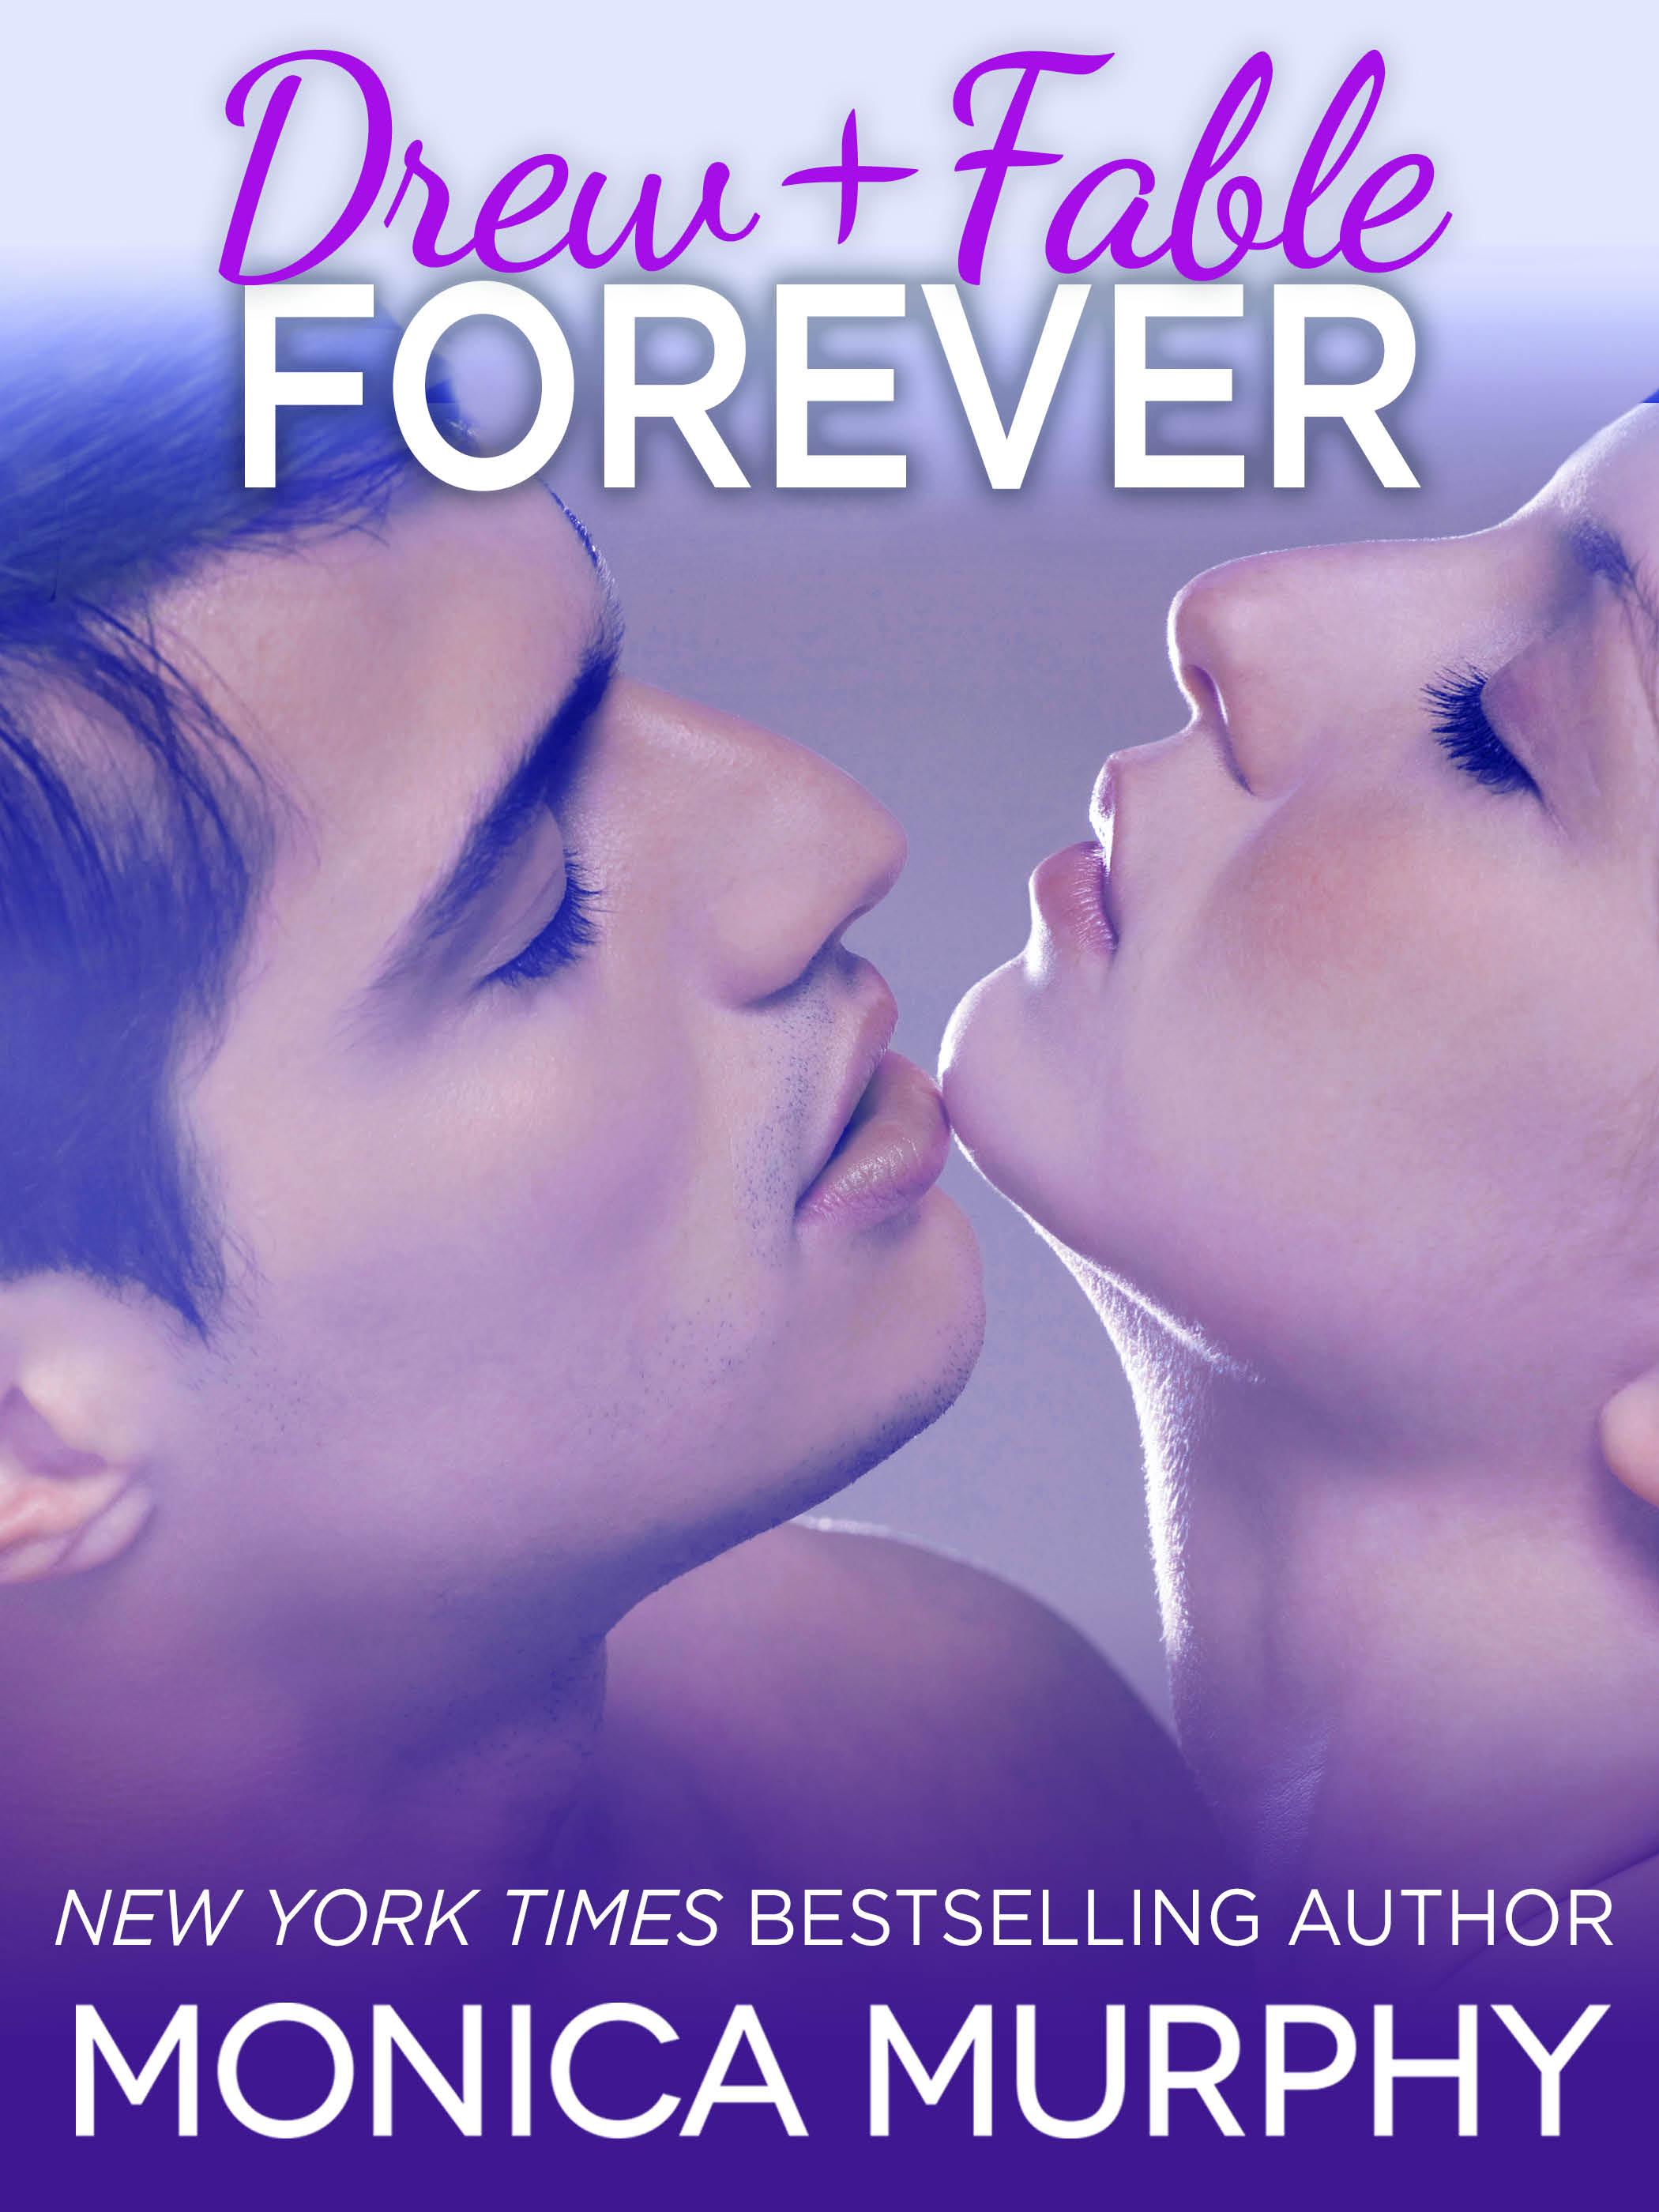 Drew + Fable Forever